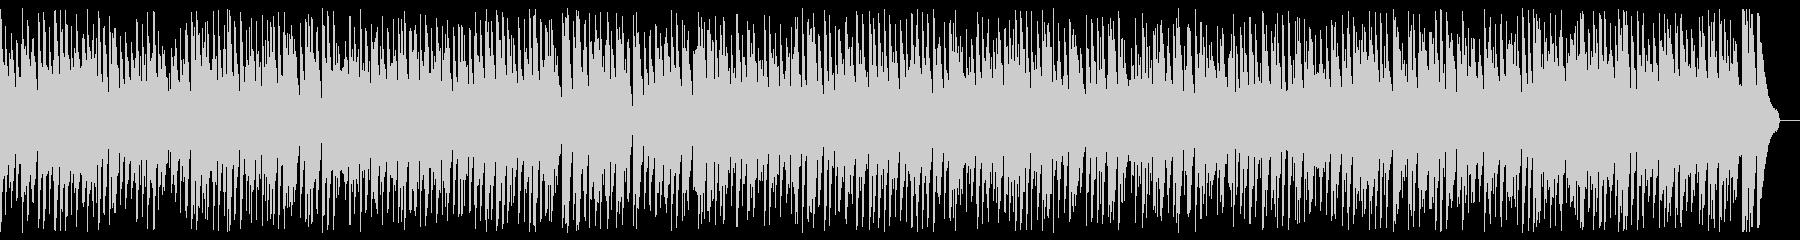 Romantic gentle cute jazz BGM's unreproduced waveform